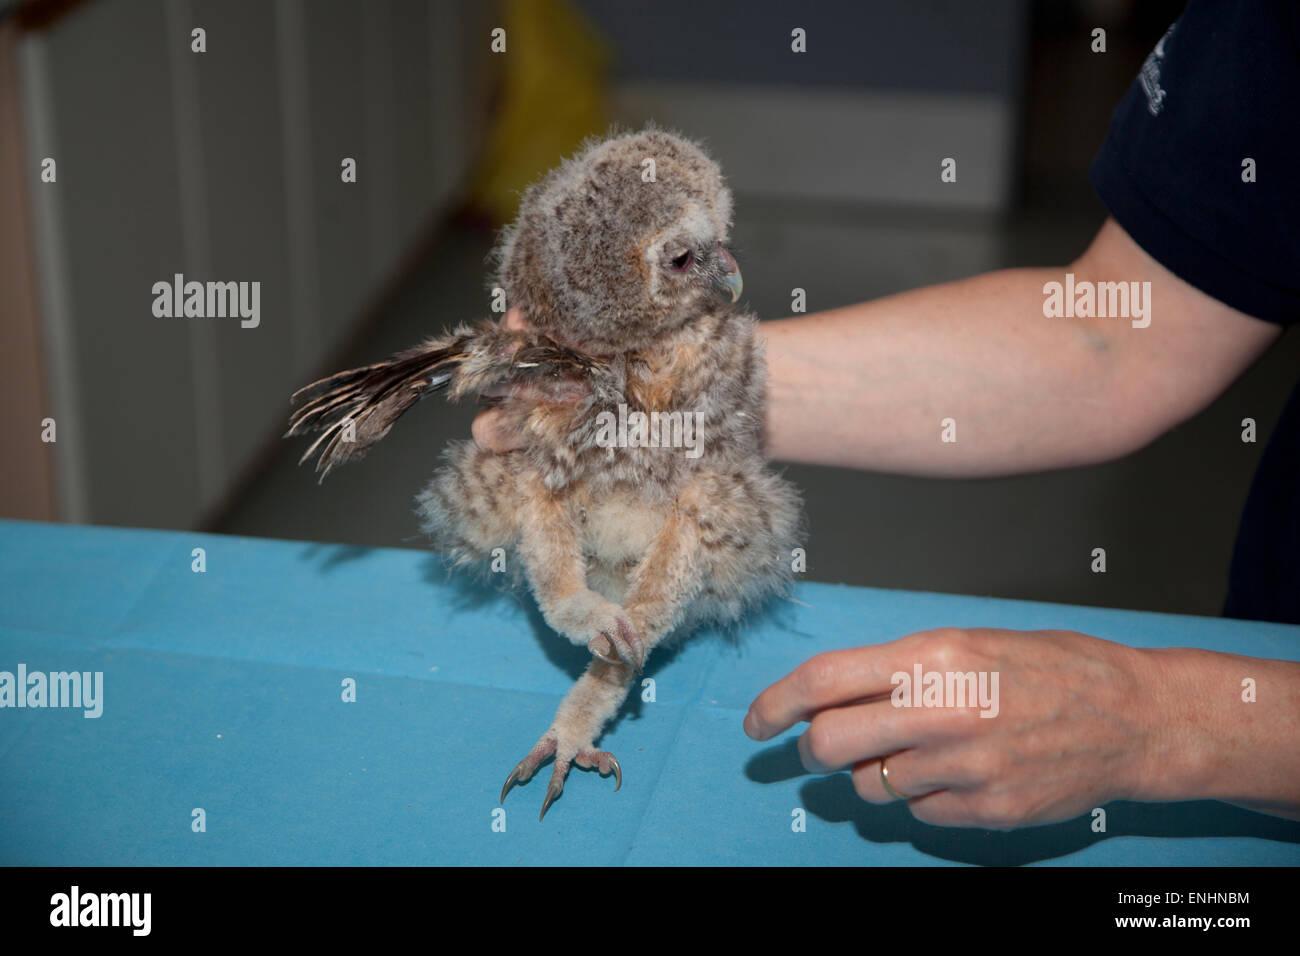 Juvenile Tawny Owl with injured wing - Stock Image